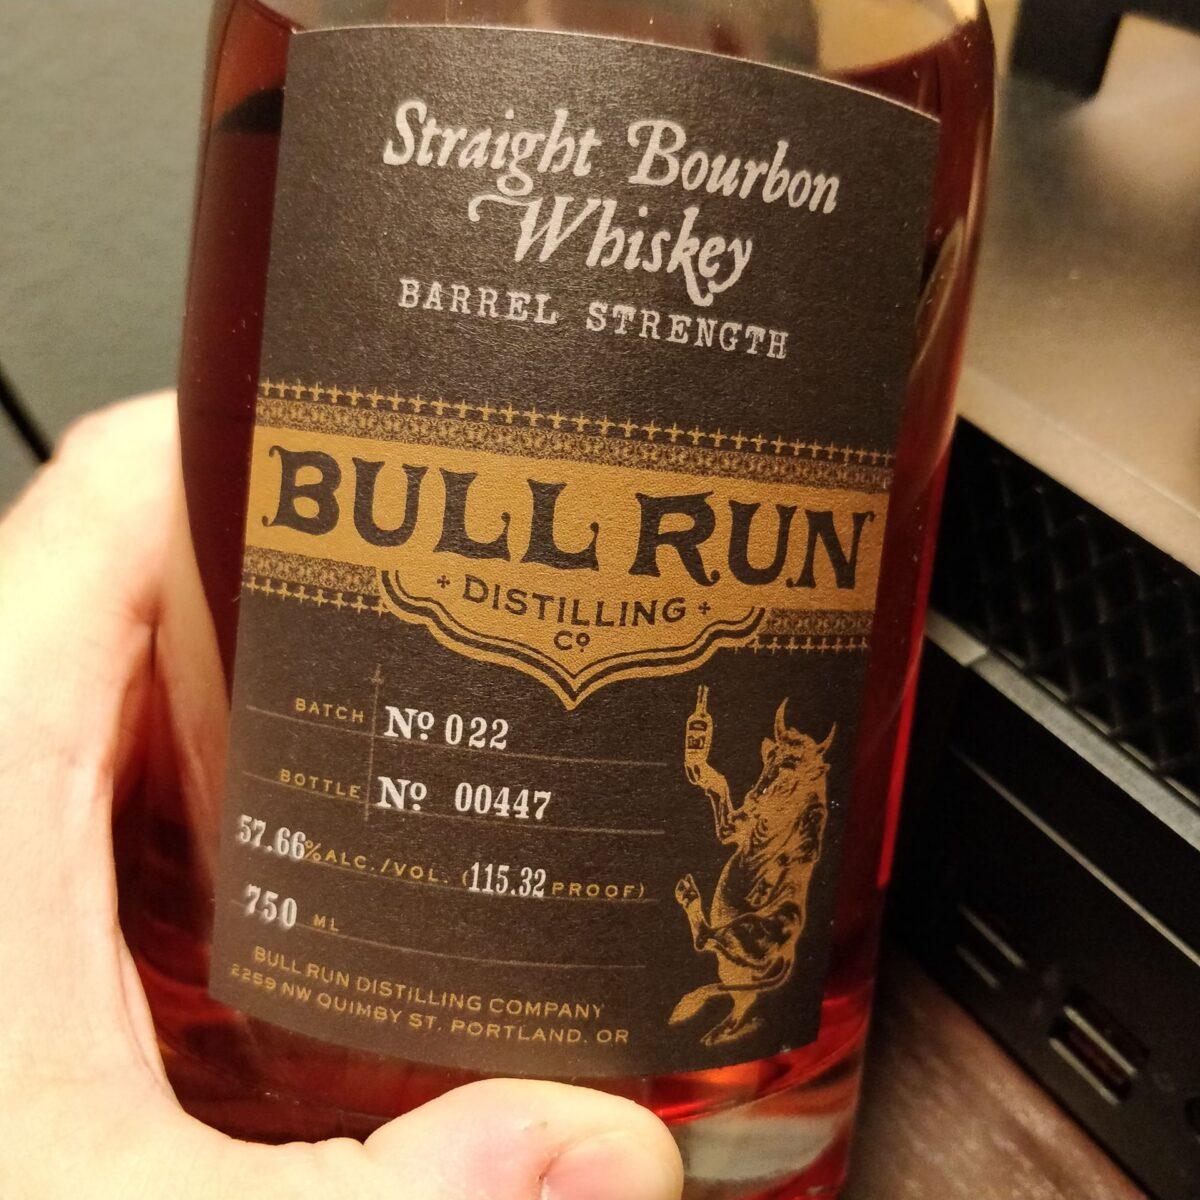 Bull Run Distilling Co Straight Bourbon Whiskey